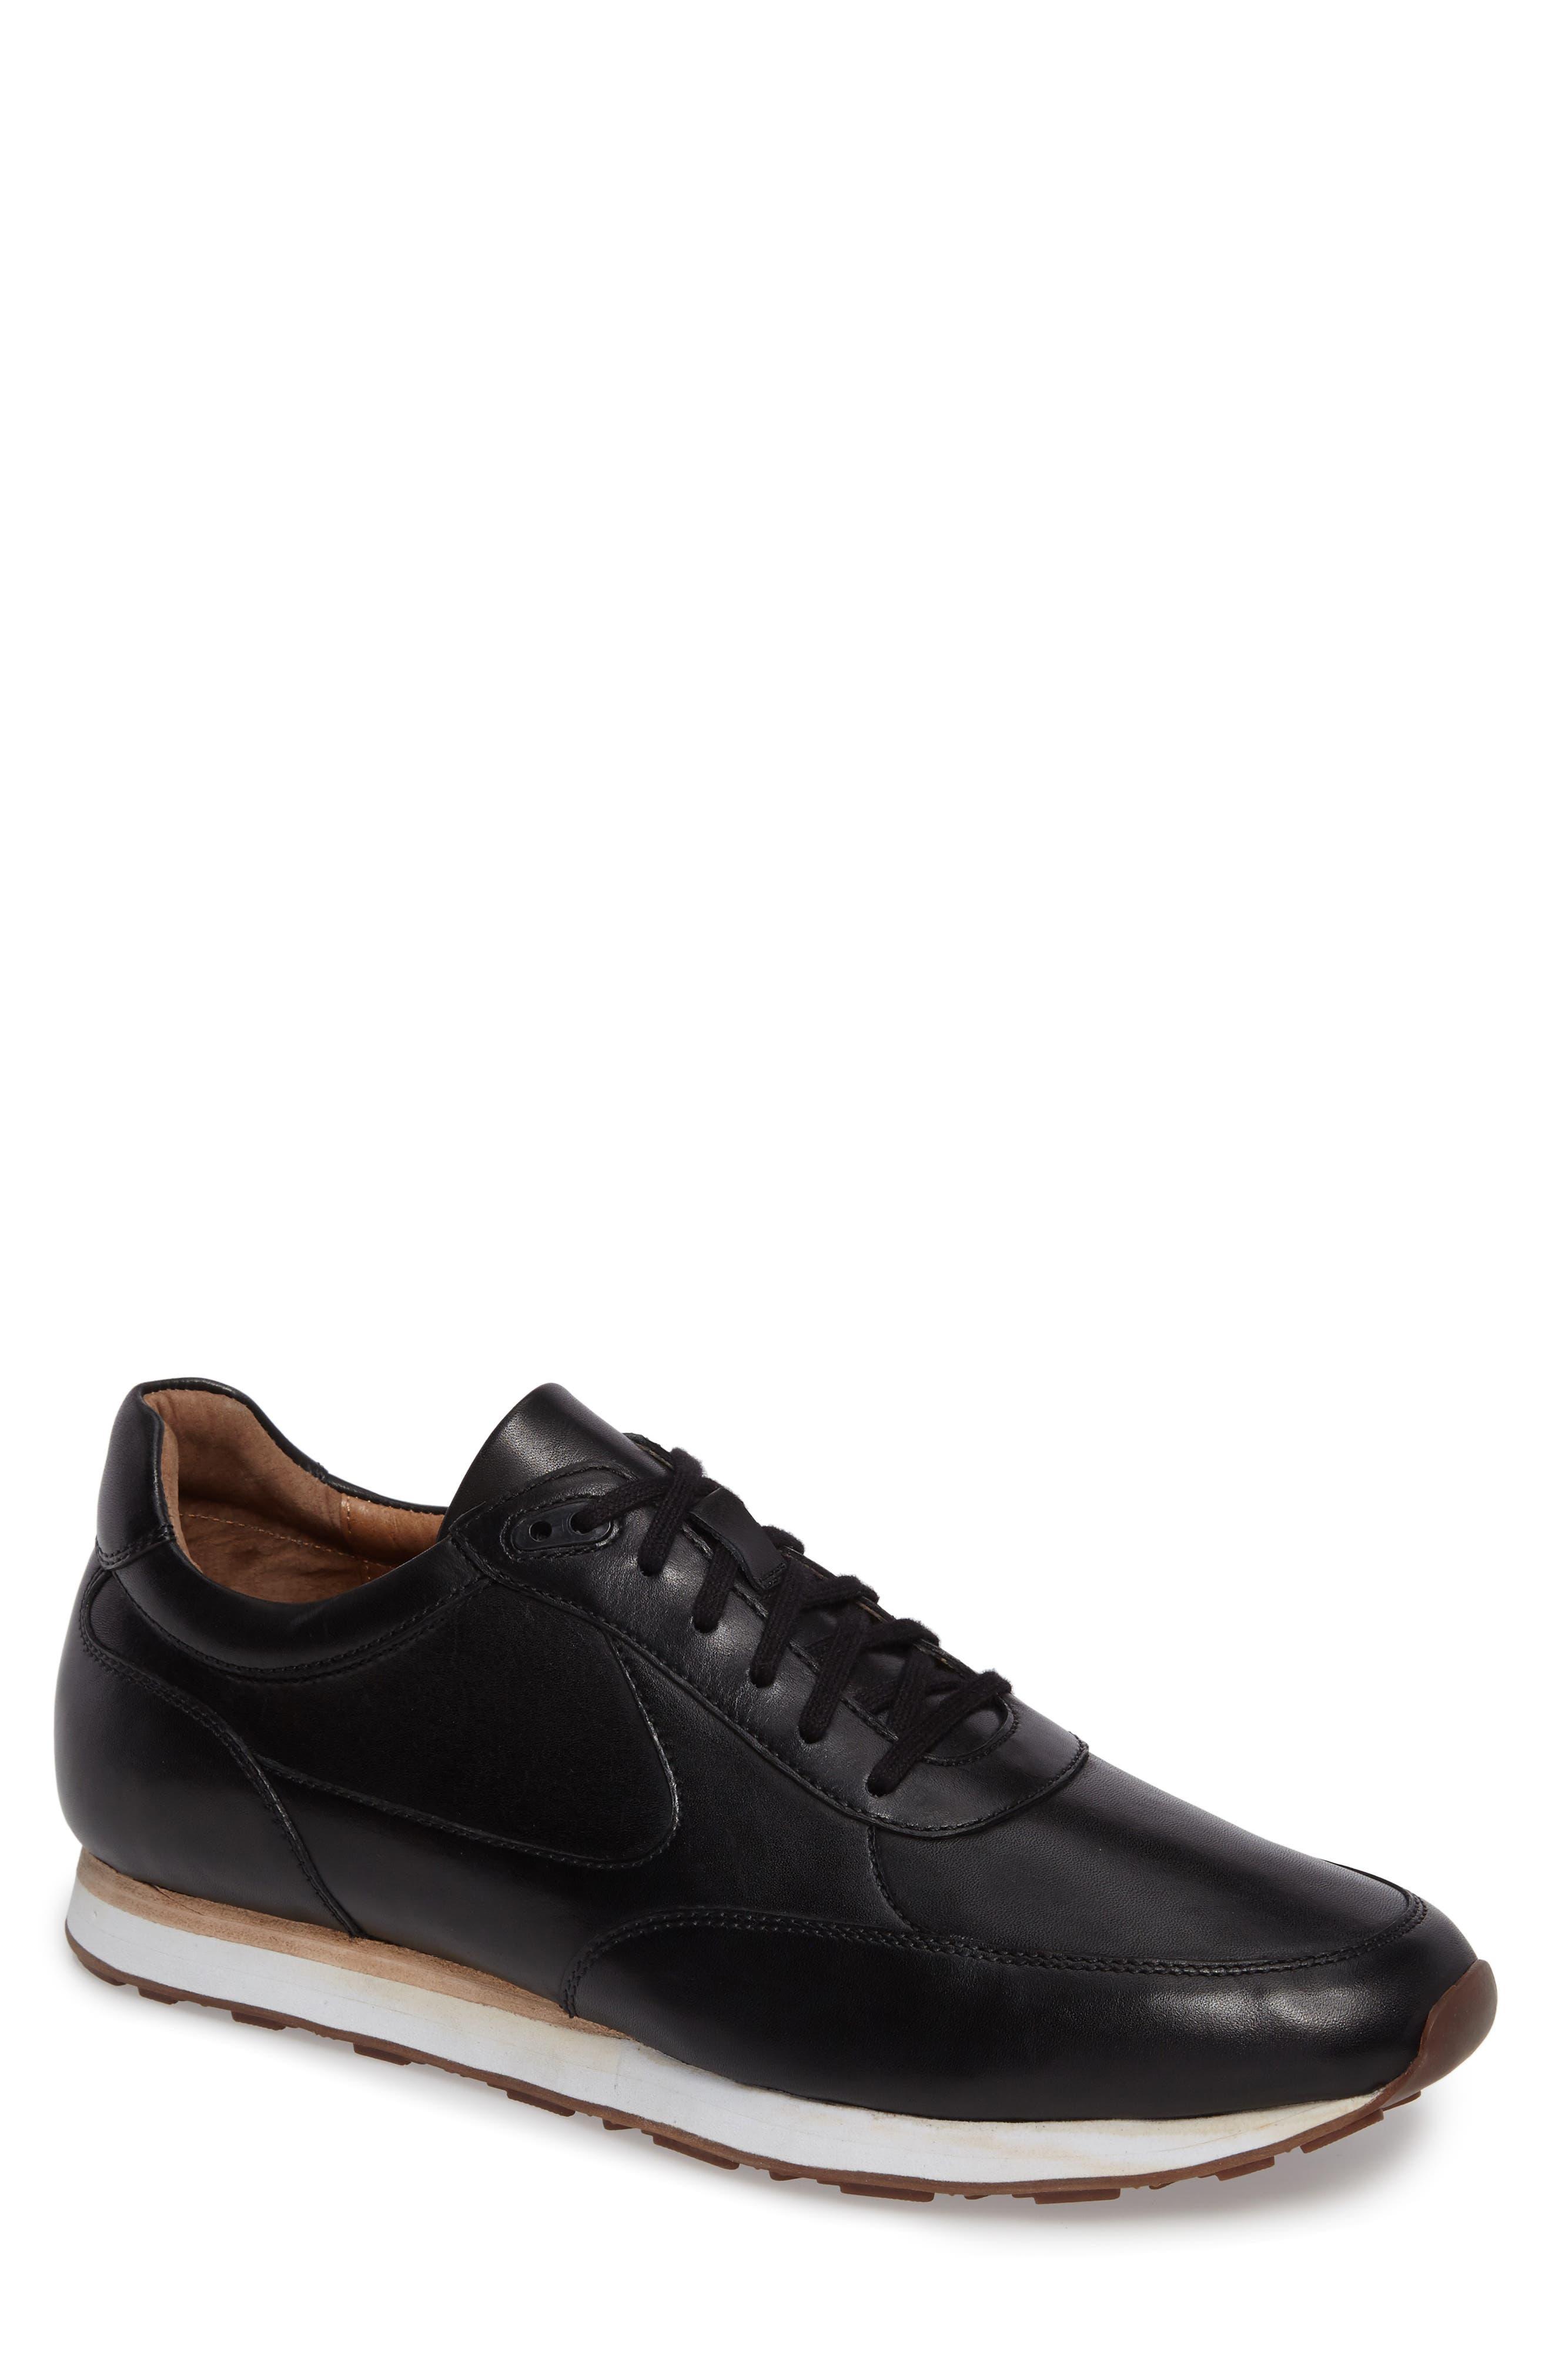 Malek Sneaker,                         Main,                         color, Black Leather